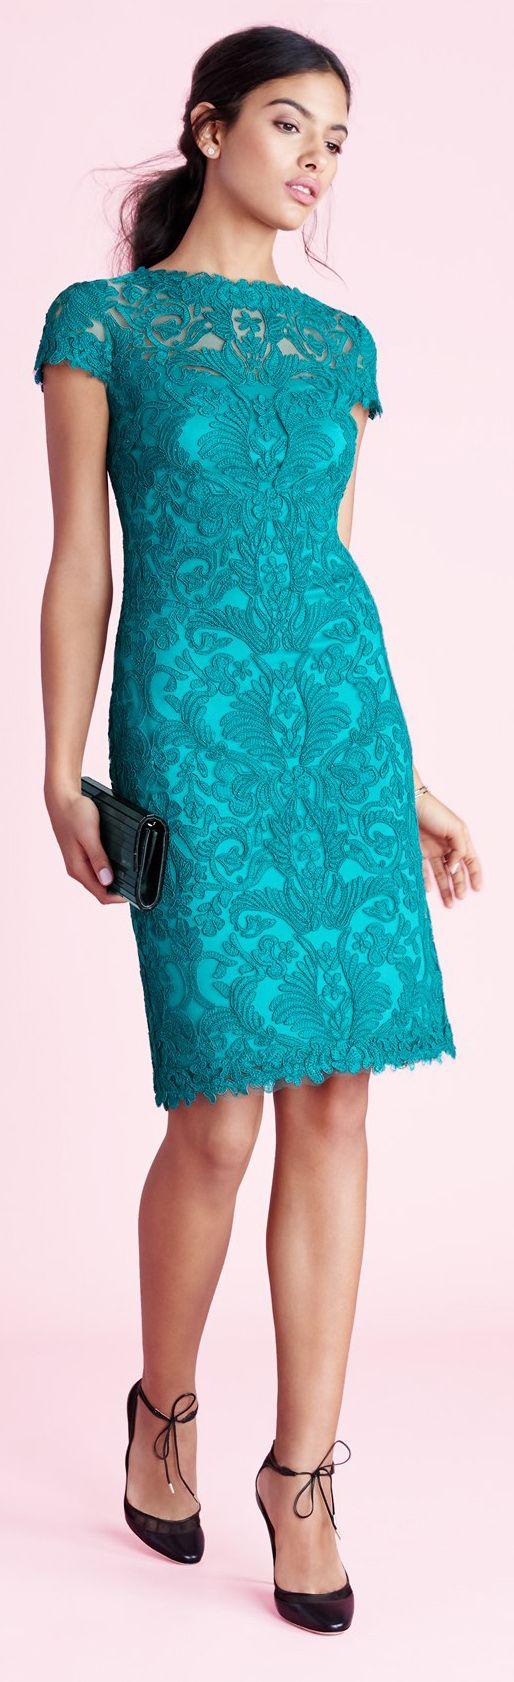 Tadashi Shoji blue turquoise lace dress women fashion outfit clothing style apparel @roressclothes closet ideas